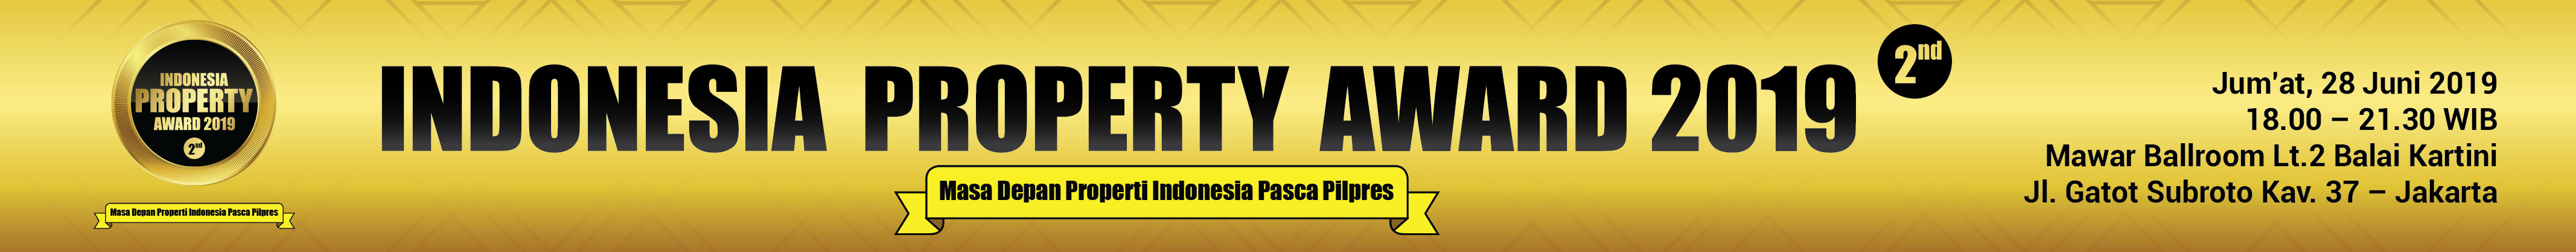 Indonesia Property Award 2019